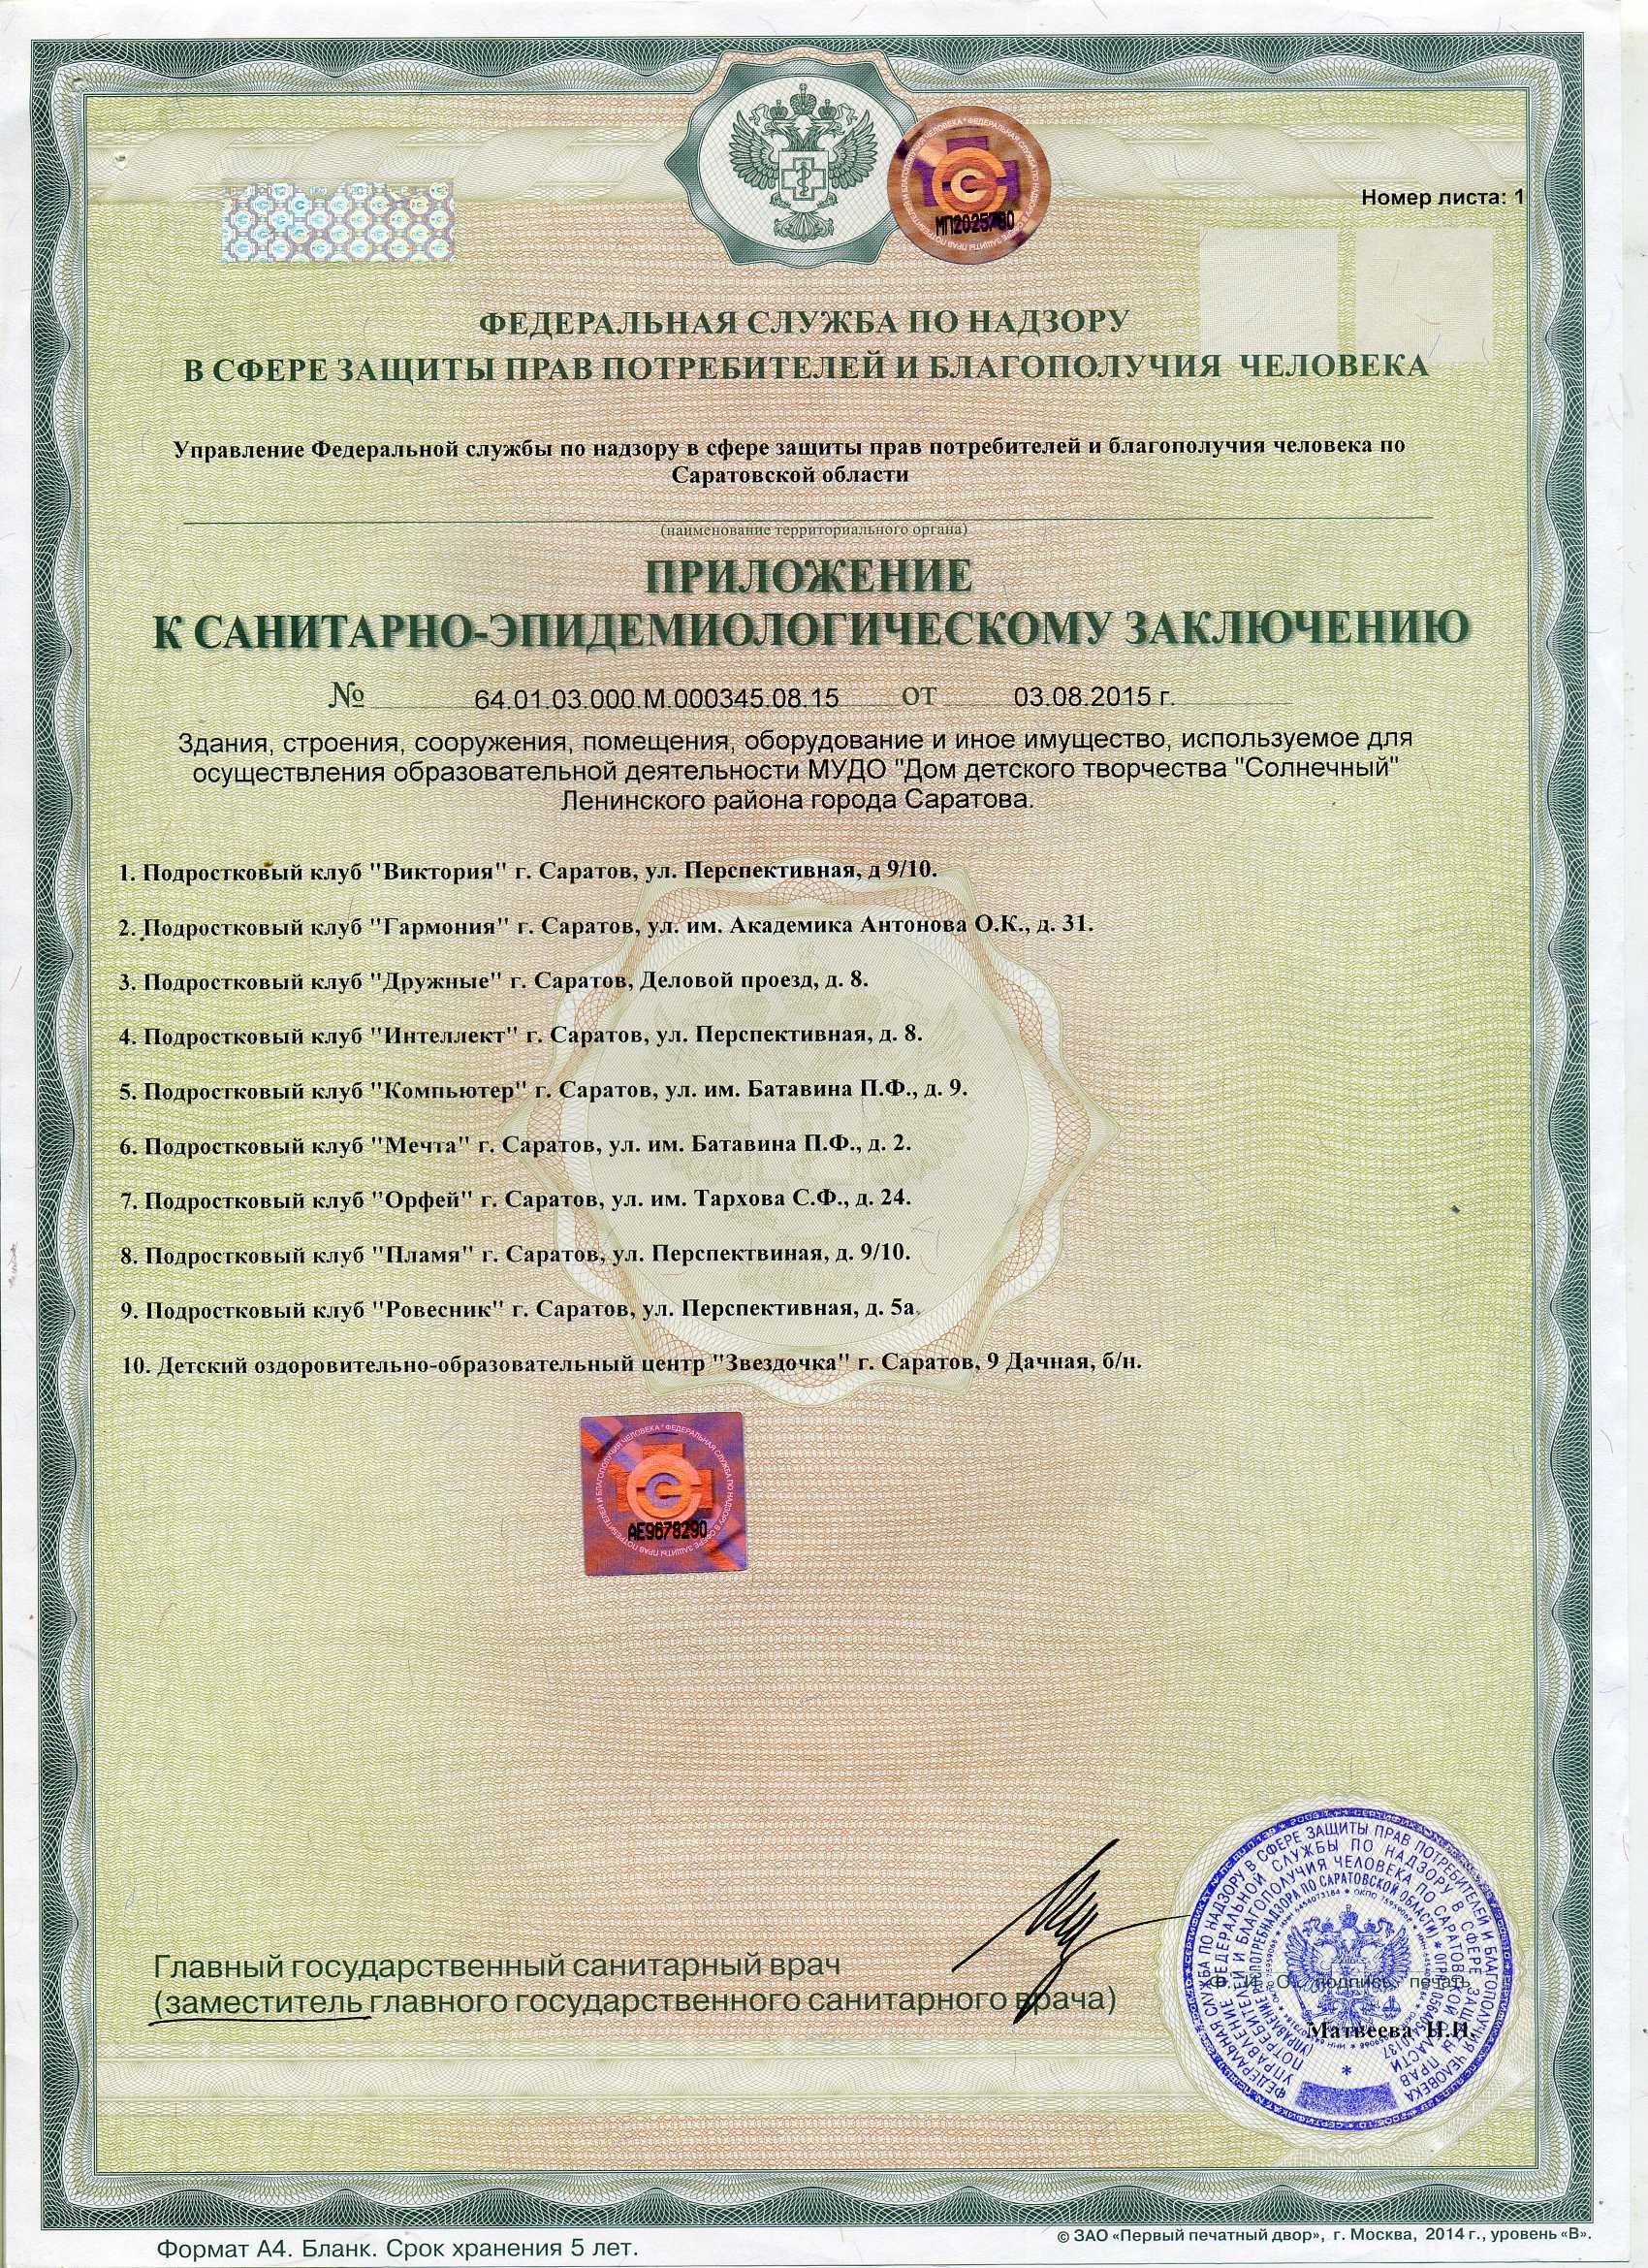 роспотребнадзор002